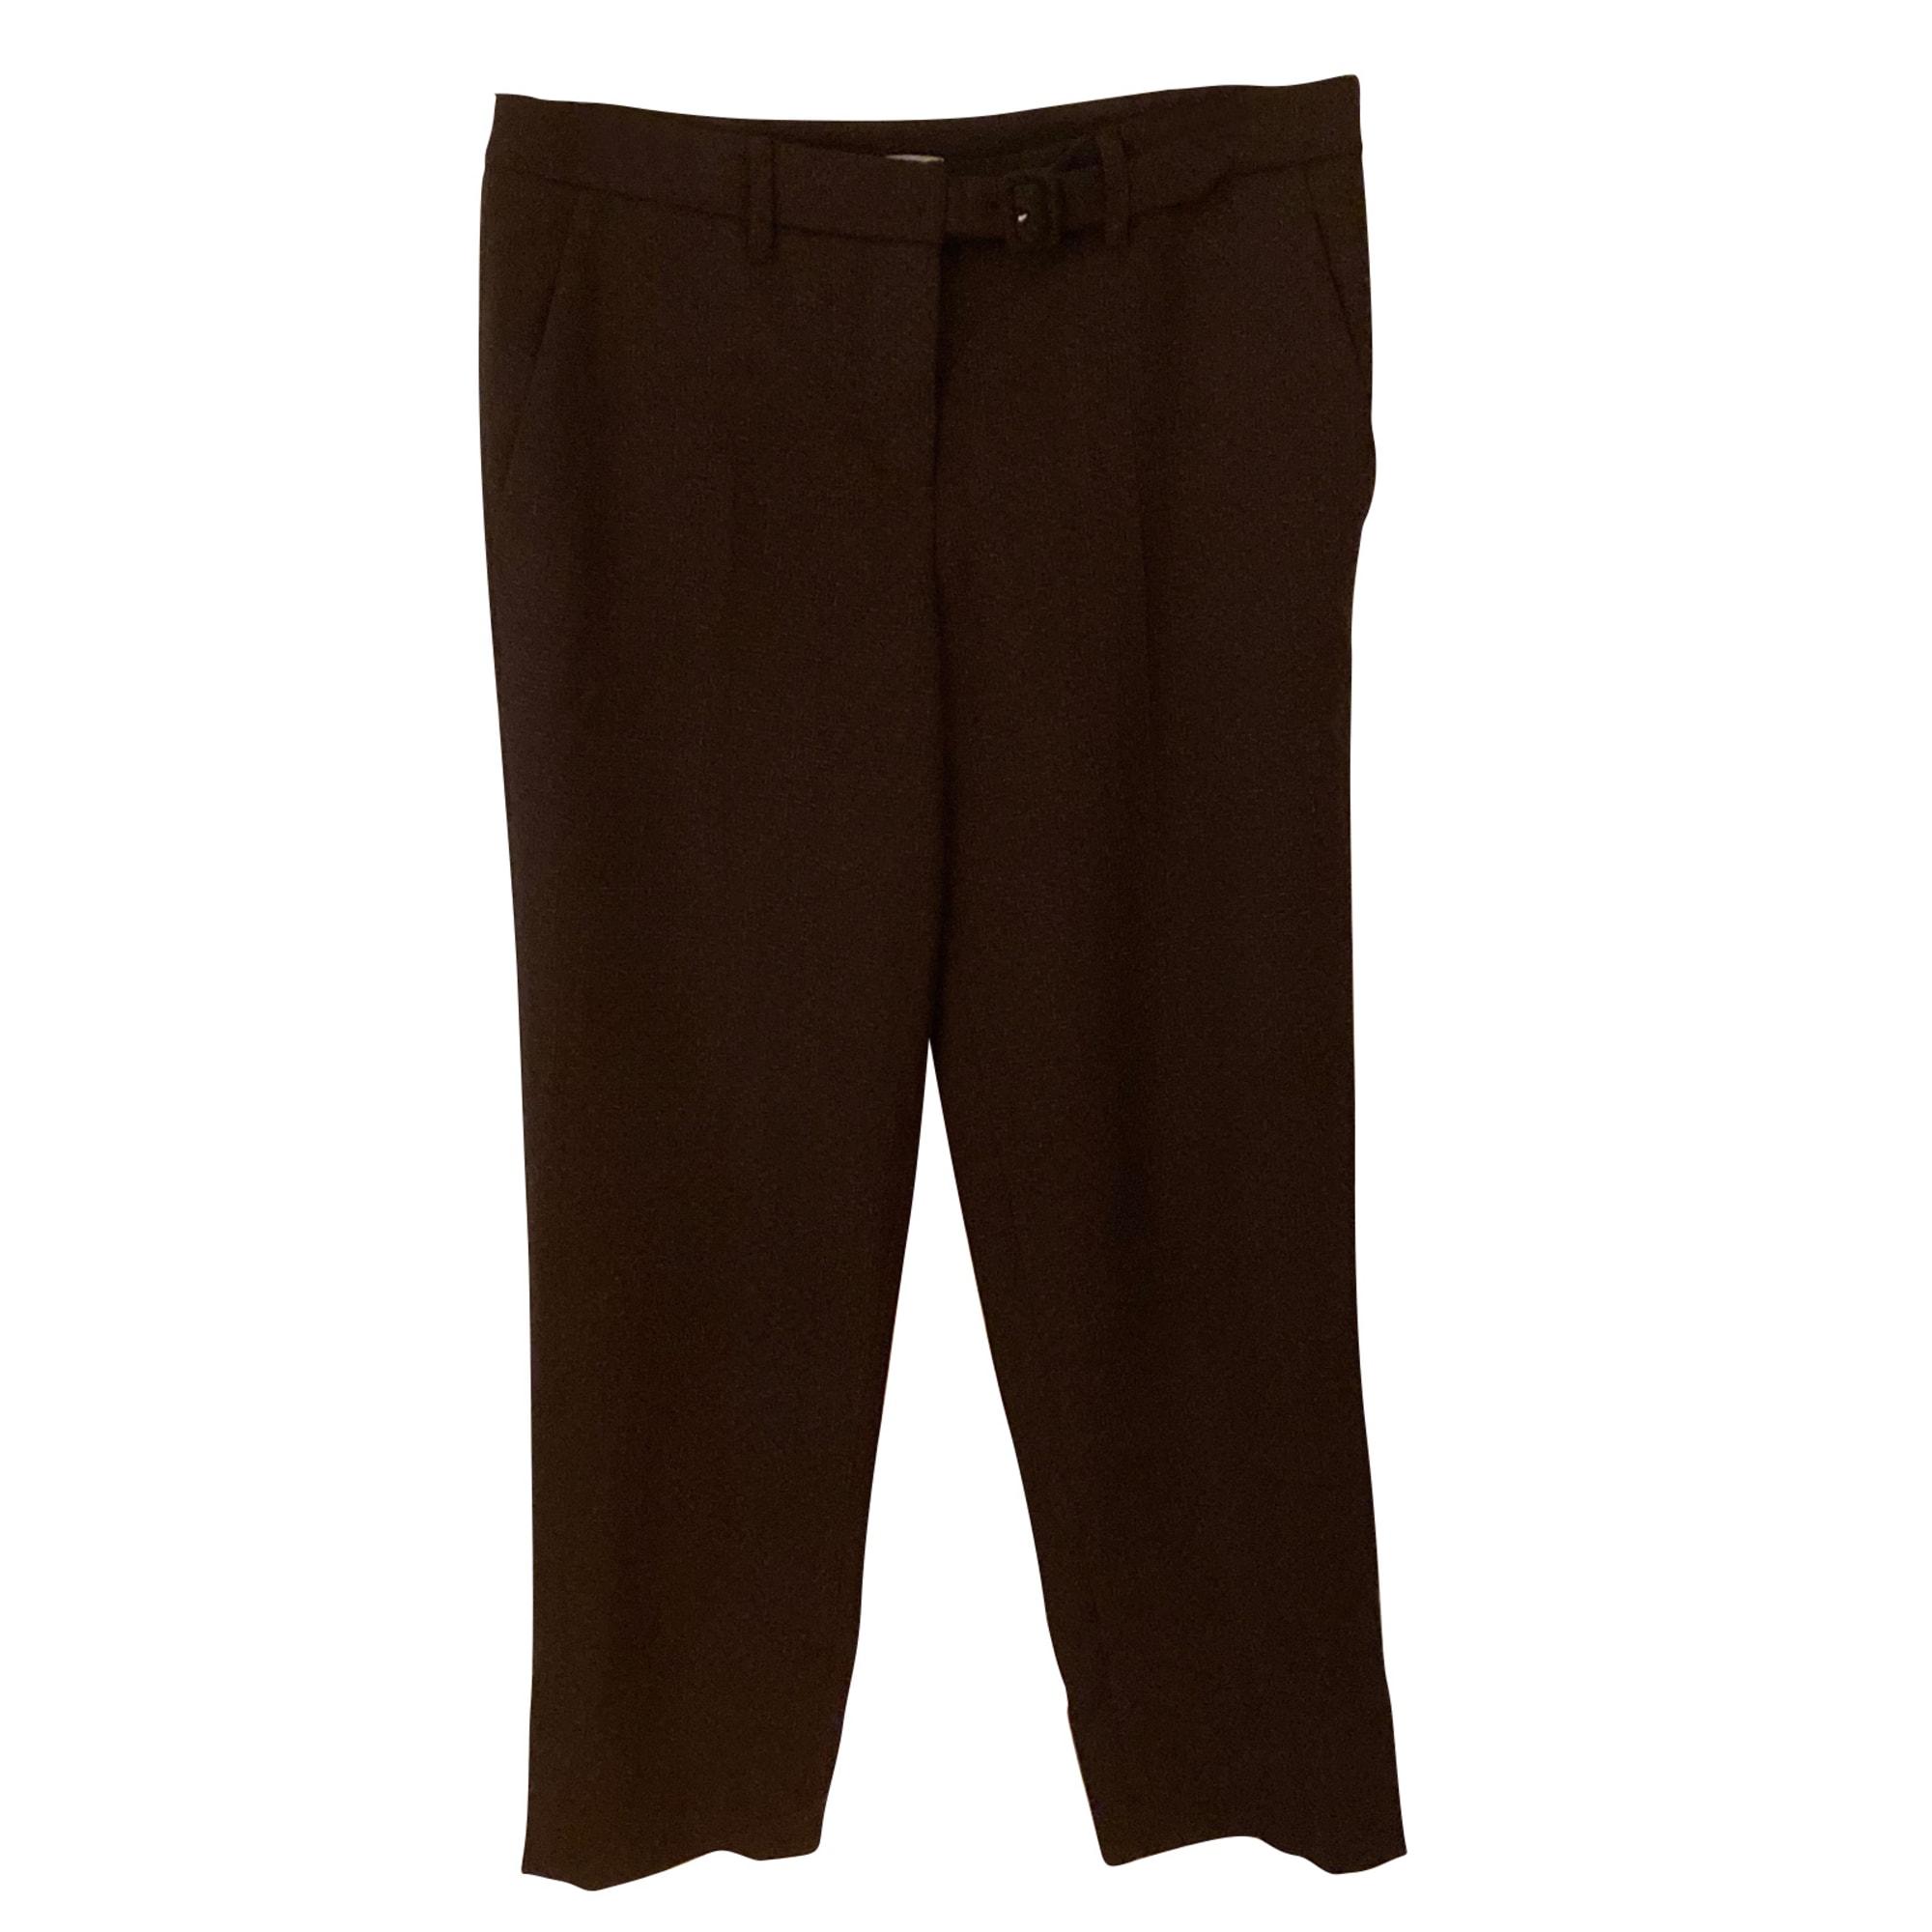 Pantalon droit MIU MIU Rouge, bordeaux